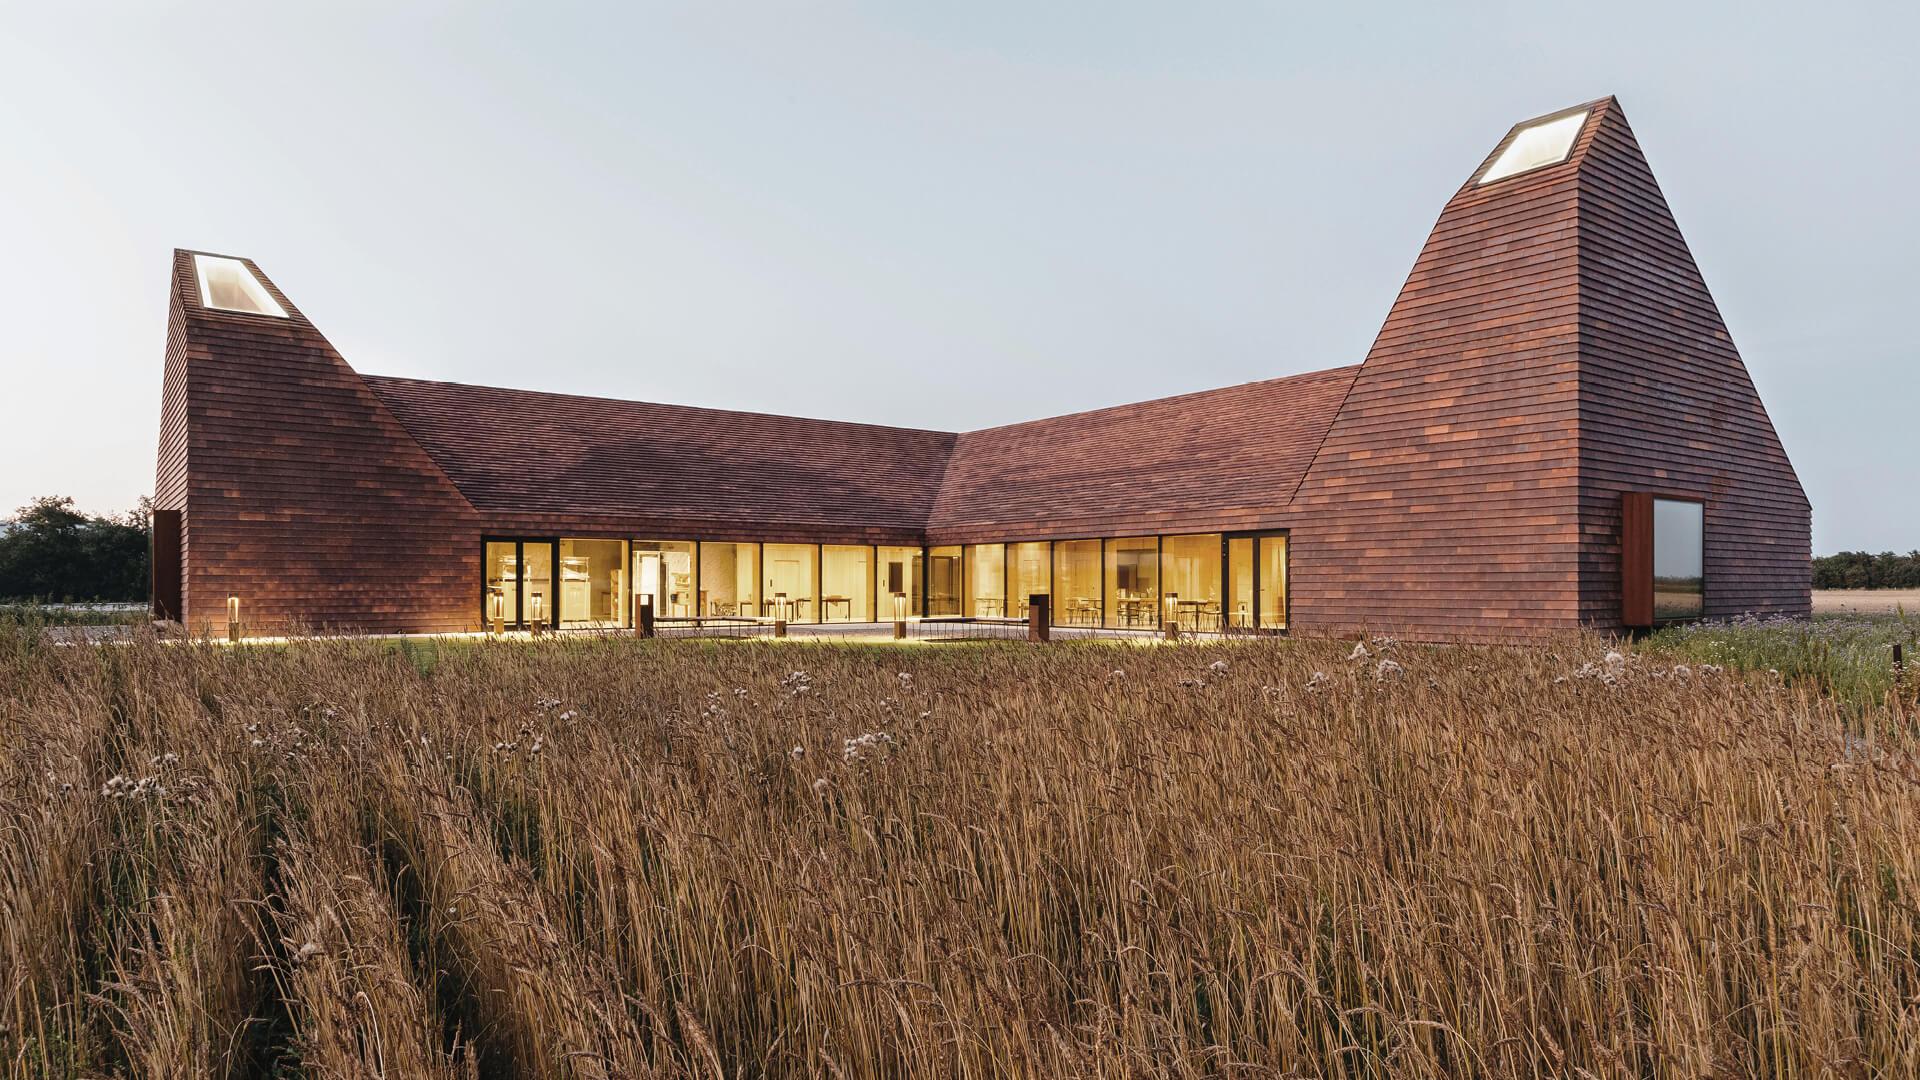 RRA reinterprets baking kilns into light wells in Denmark's 'House of Grain'